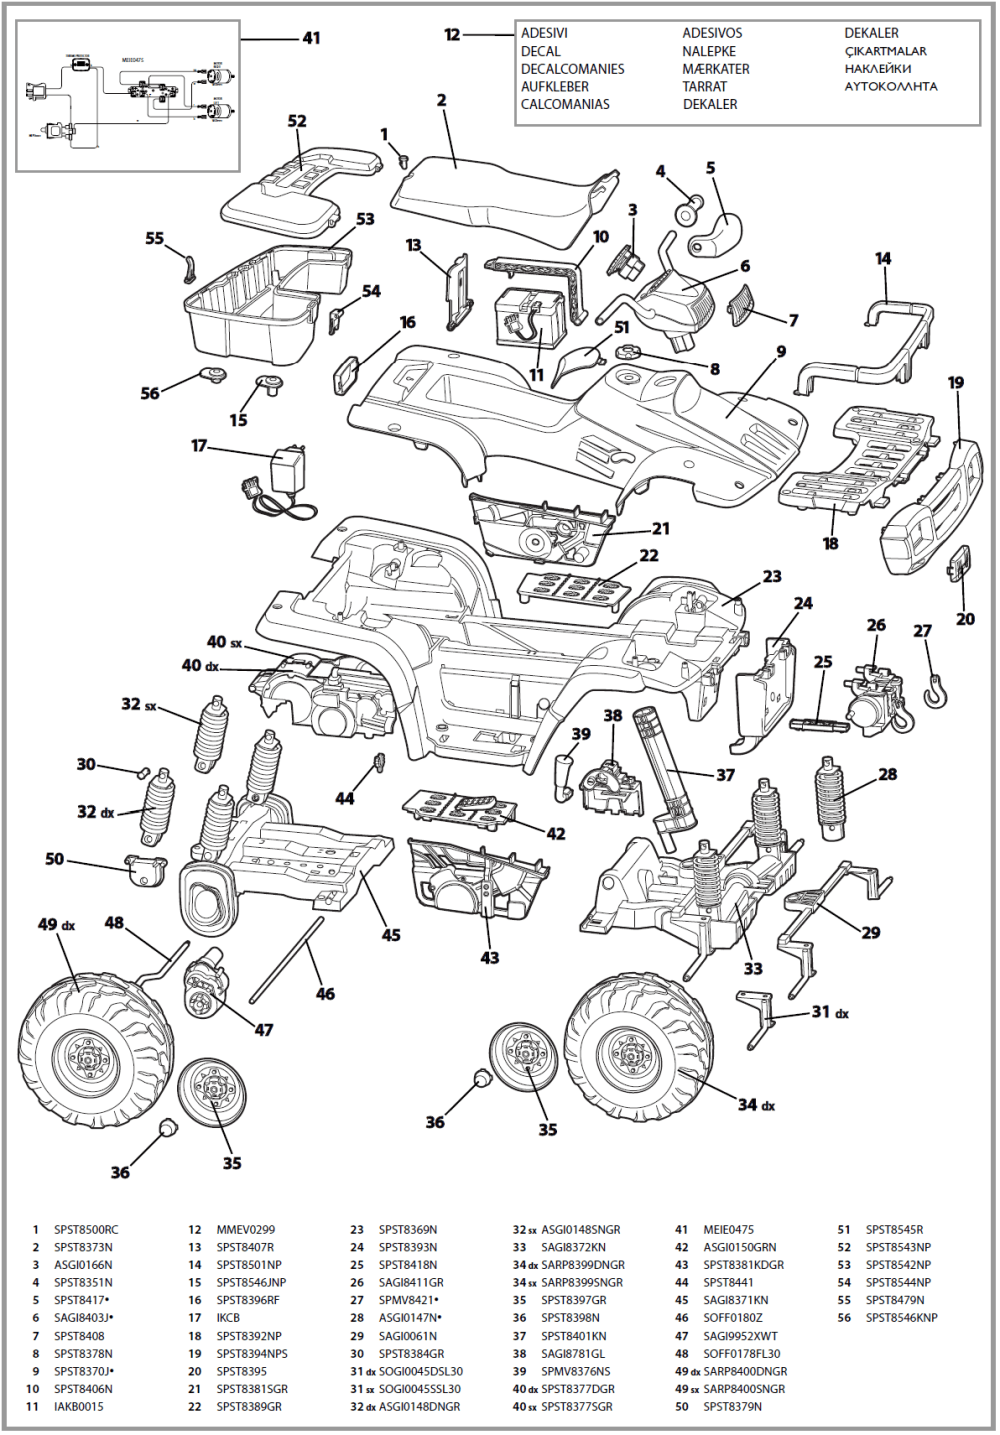 medium resolution of suzuki king quad 500 wiring diagram get free image about 2008 polaris sportsman 500 efi owner s manual 2008 polaris sportsman 500 ho service manual download